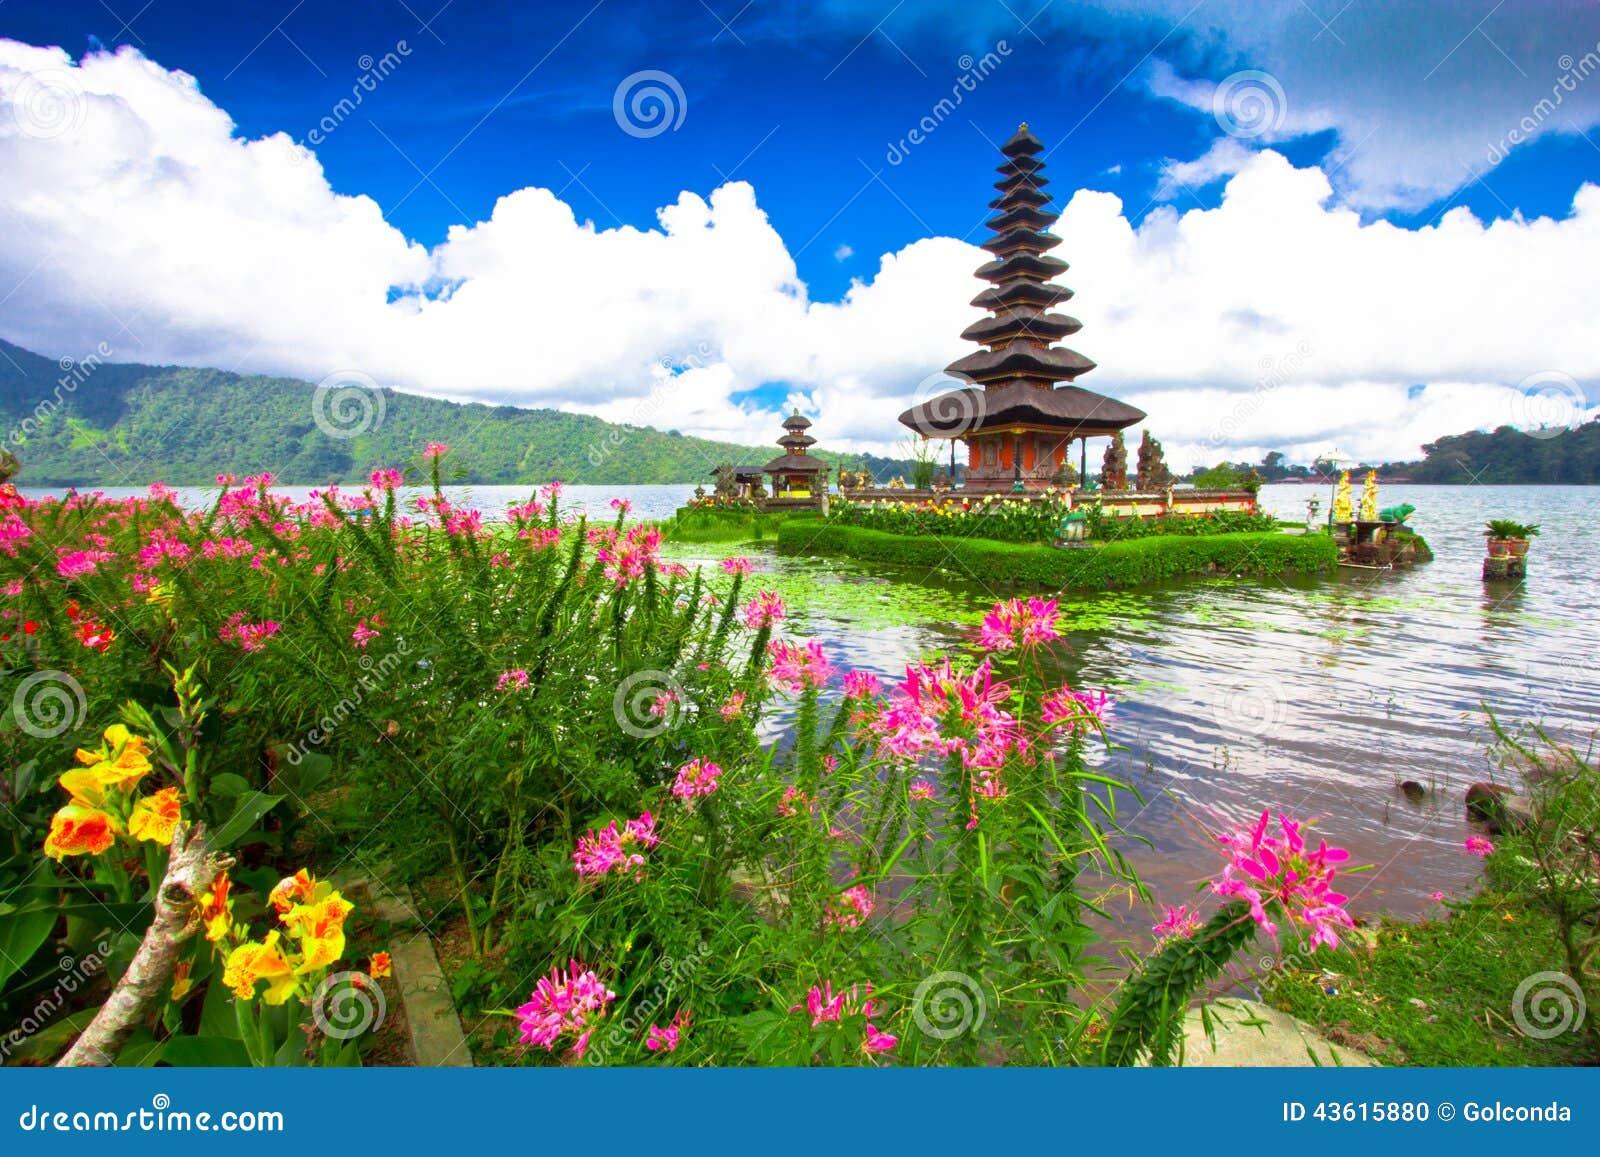 Templo de Pura Ulun Danu em um lago Beratan Bali, Indonésia